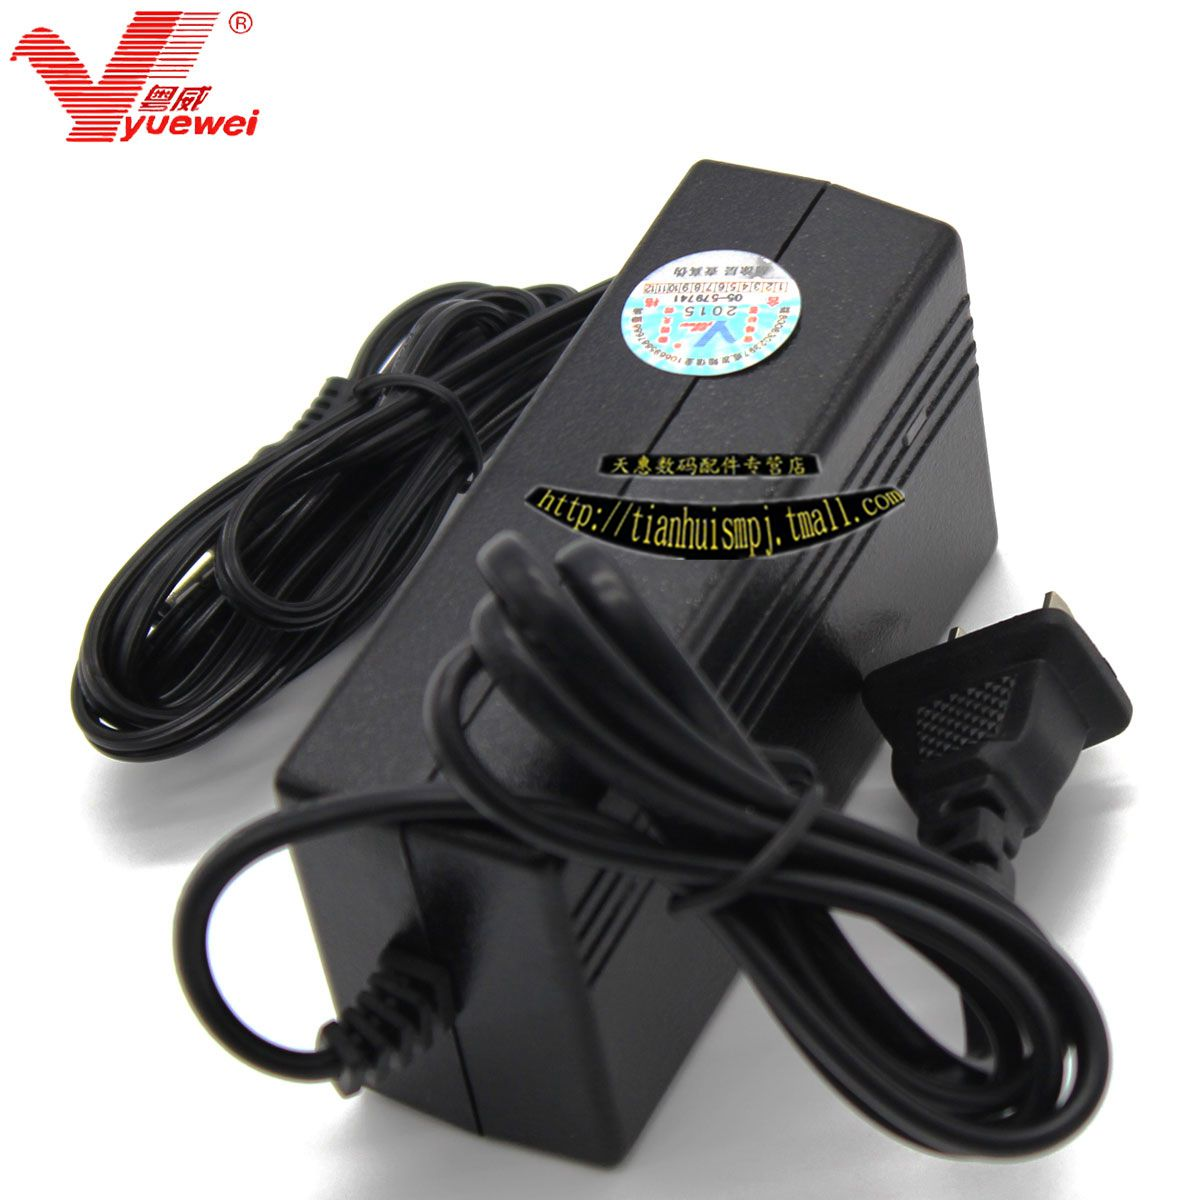 L132B 粤威牌12V变压器适用12V外接电源适配器